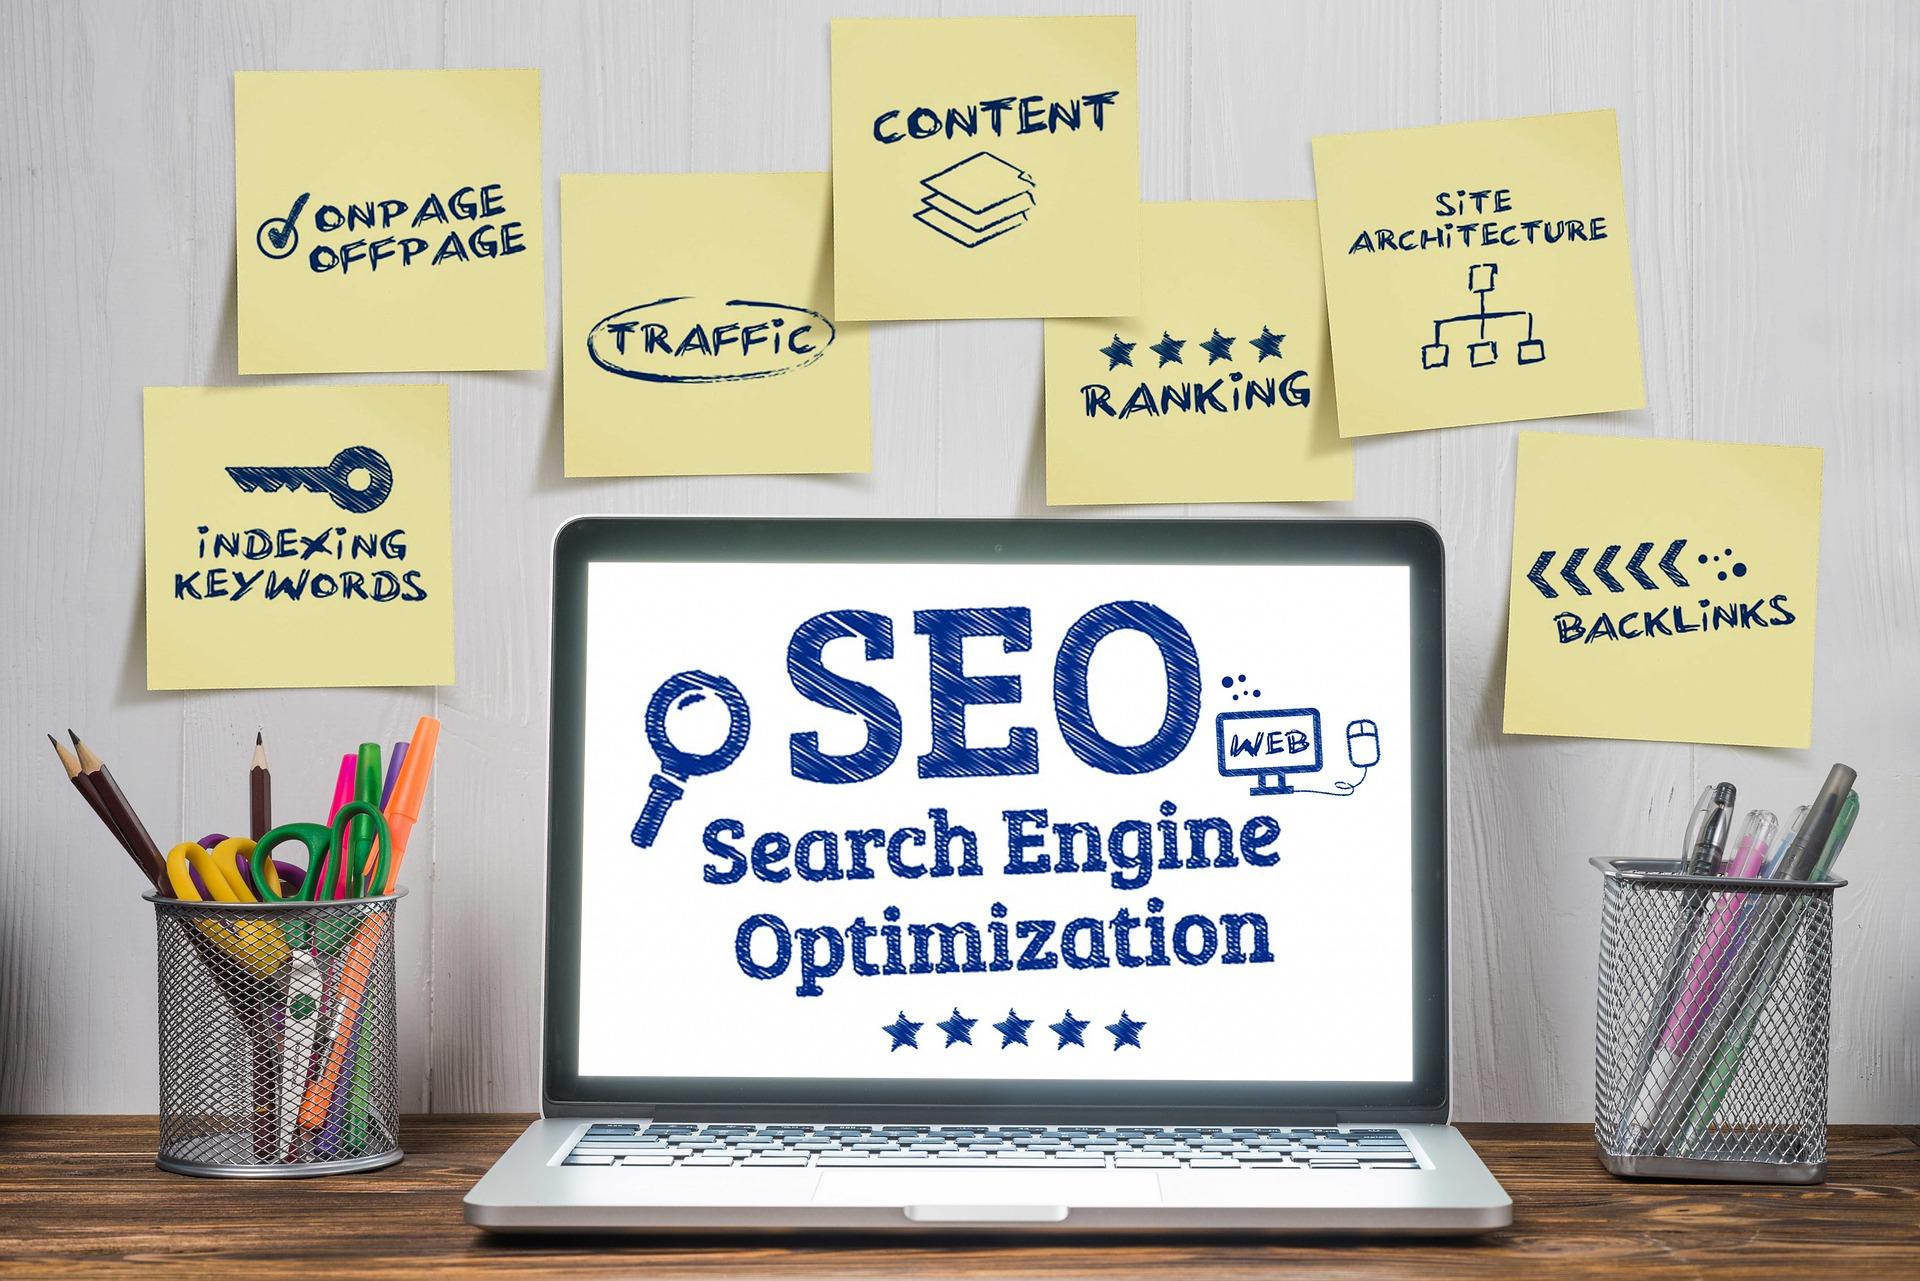 What is SEO, how to do best seo, seo, seo tips for beginners, seo tips website, seo tips for website